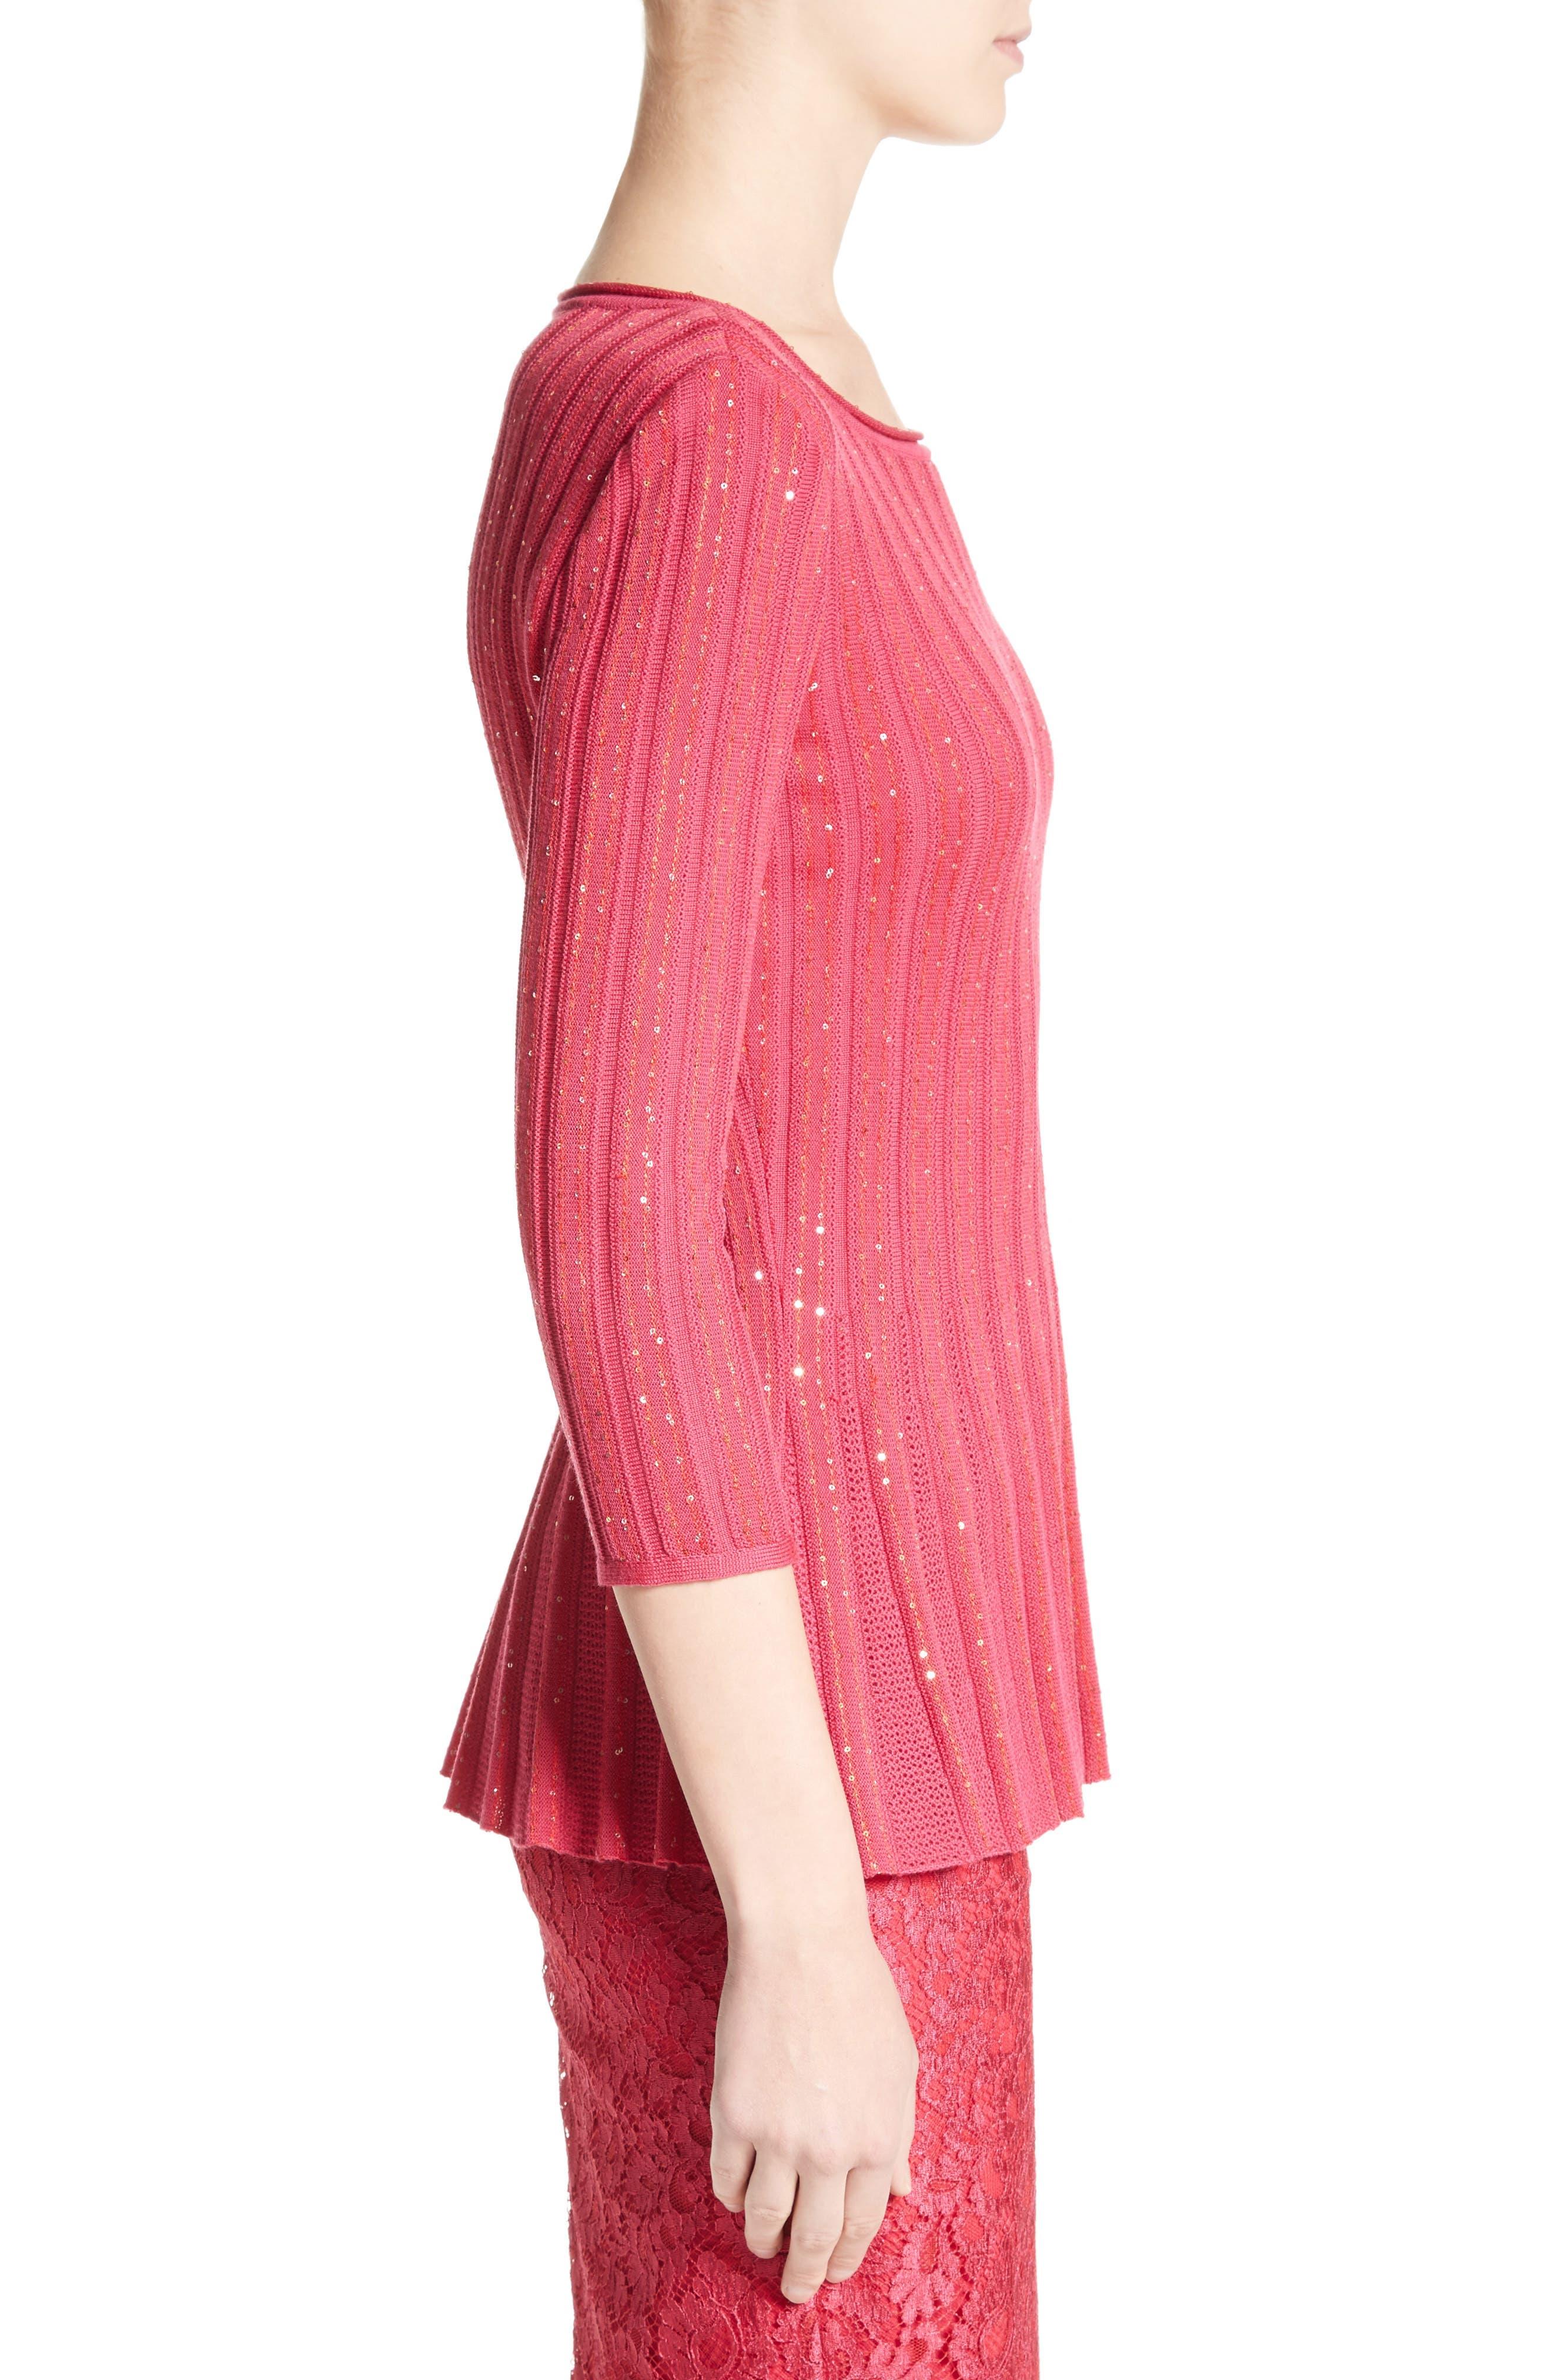 Chriag Sequin Knit Peplum Top,                             Alternate thumbnail 3, color,